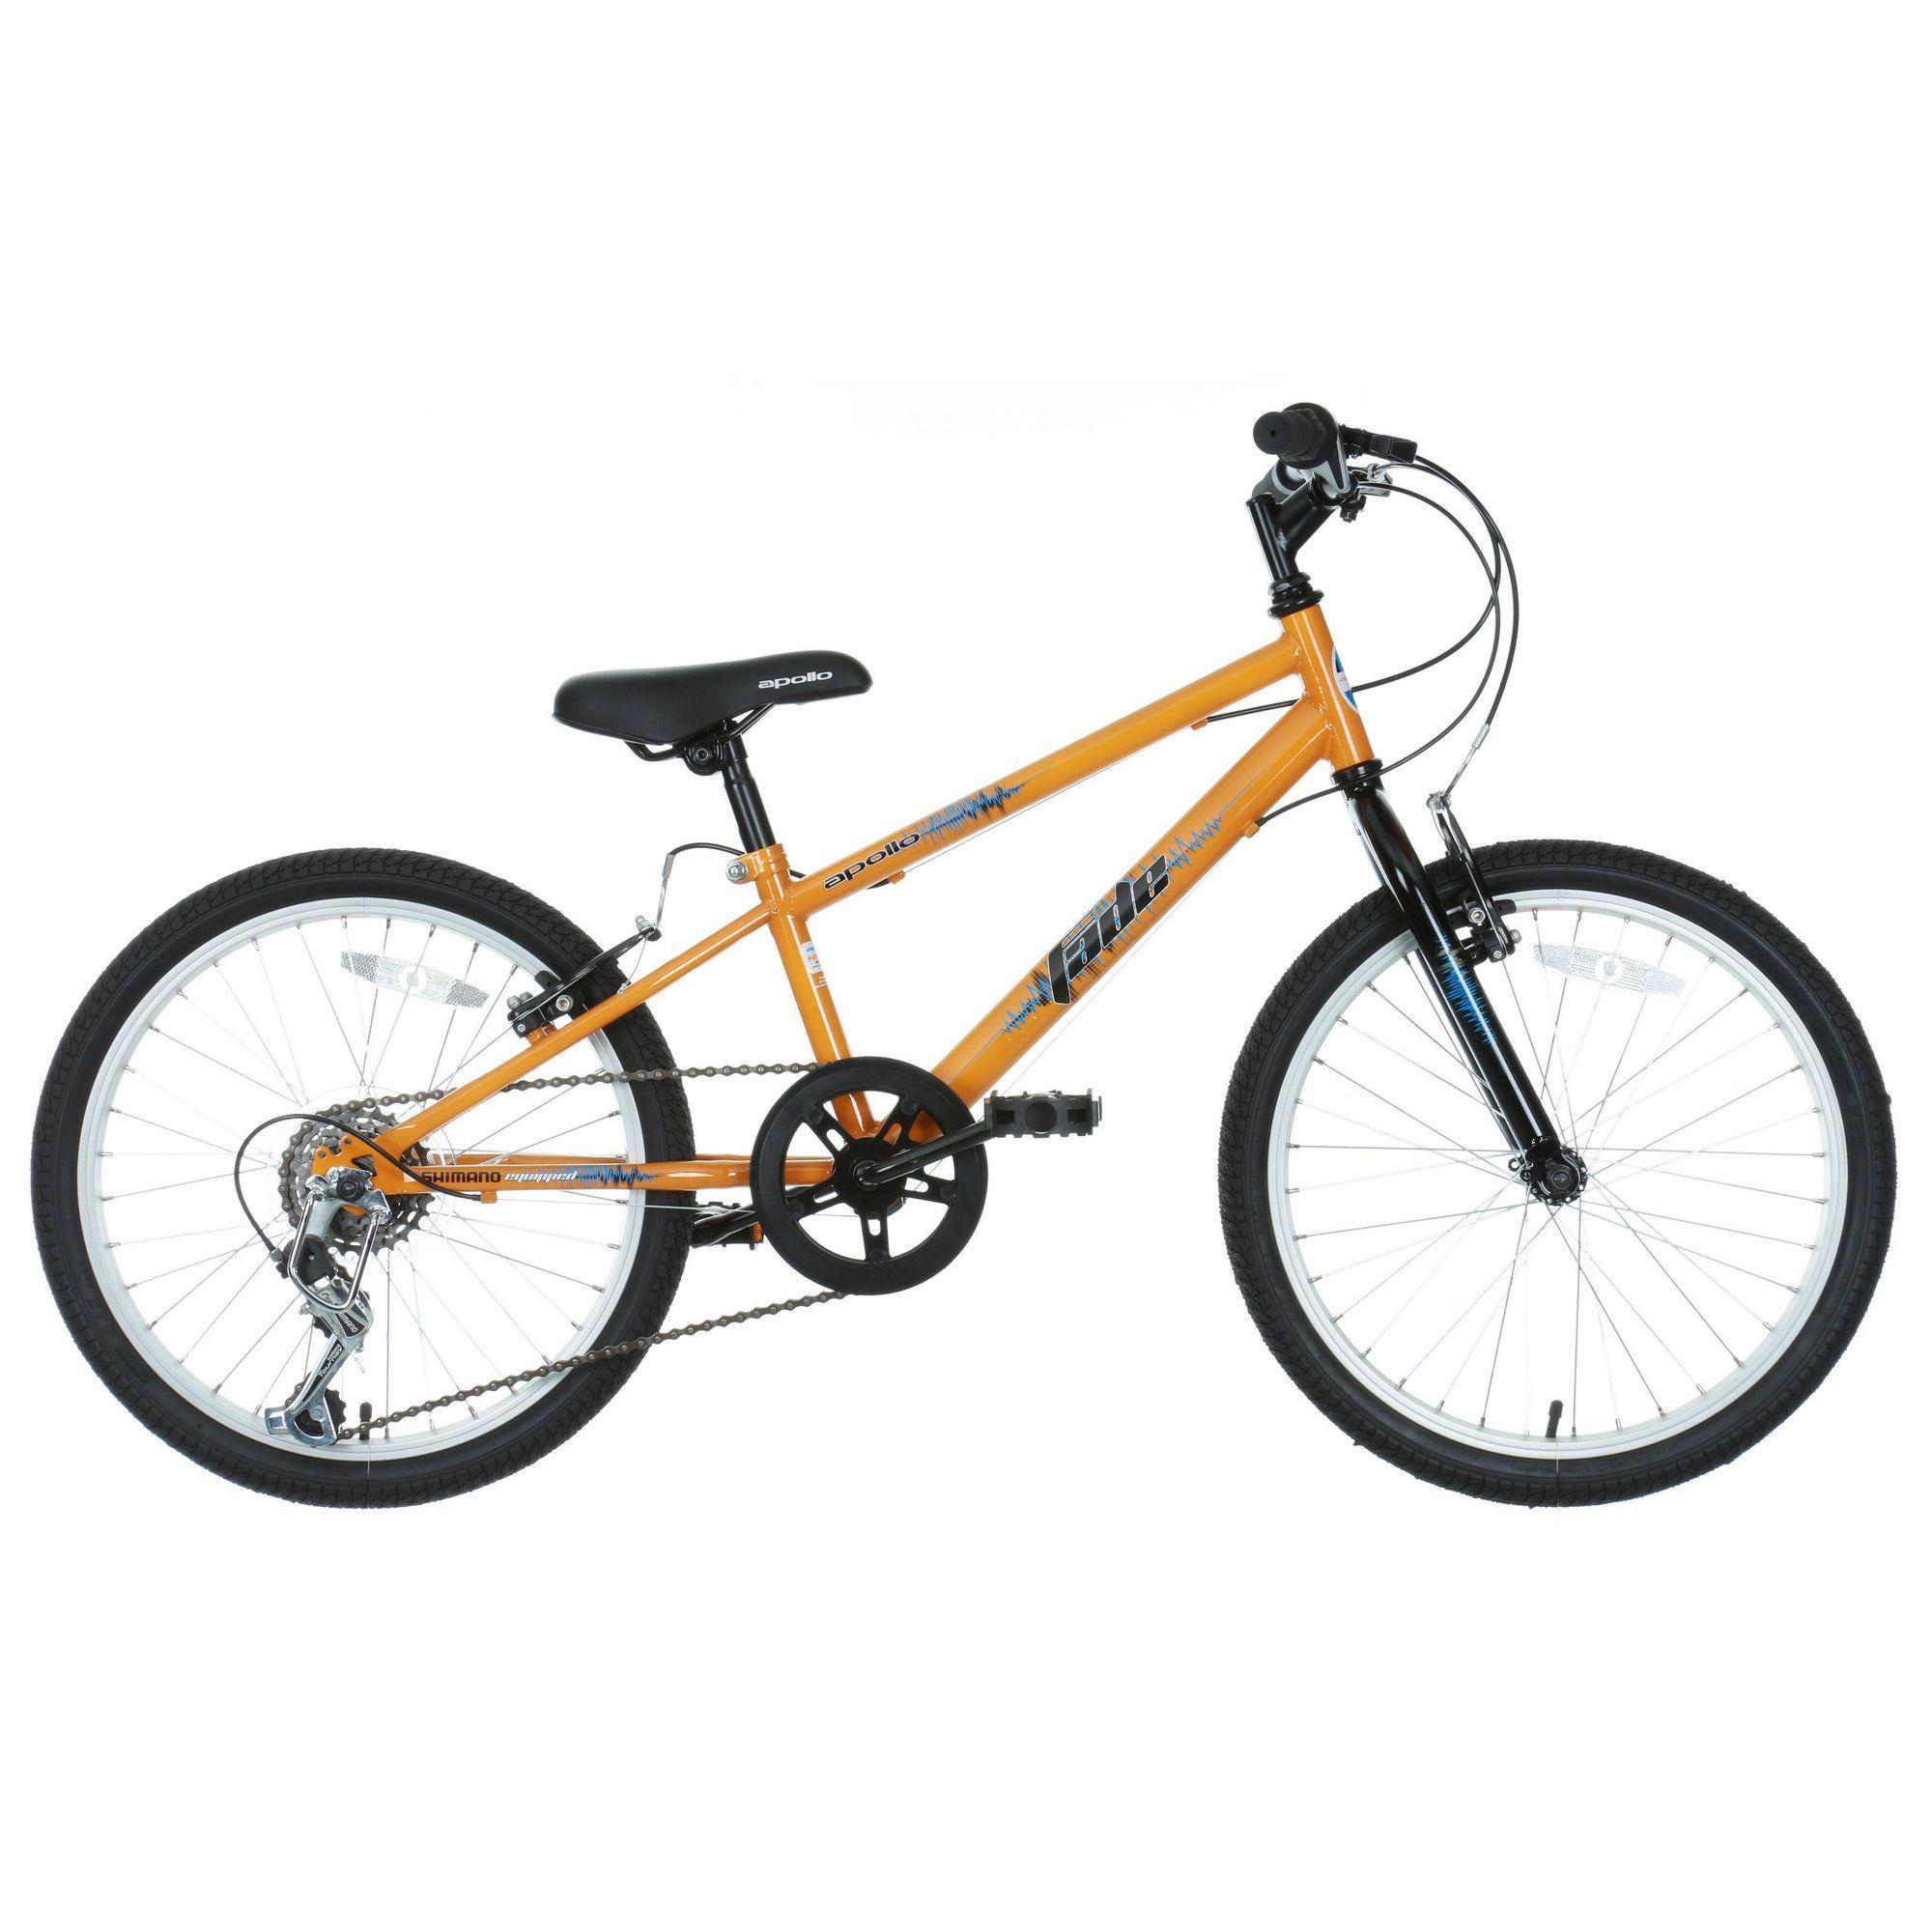 Ssr Vs Apollo Pit Bikes Www Powerdirtbikes Com With Images